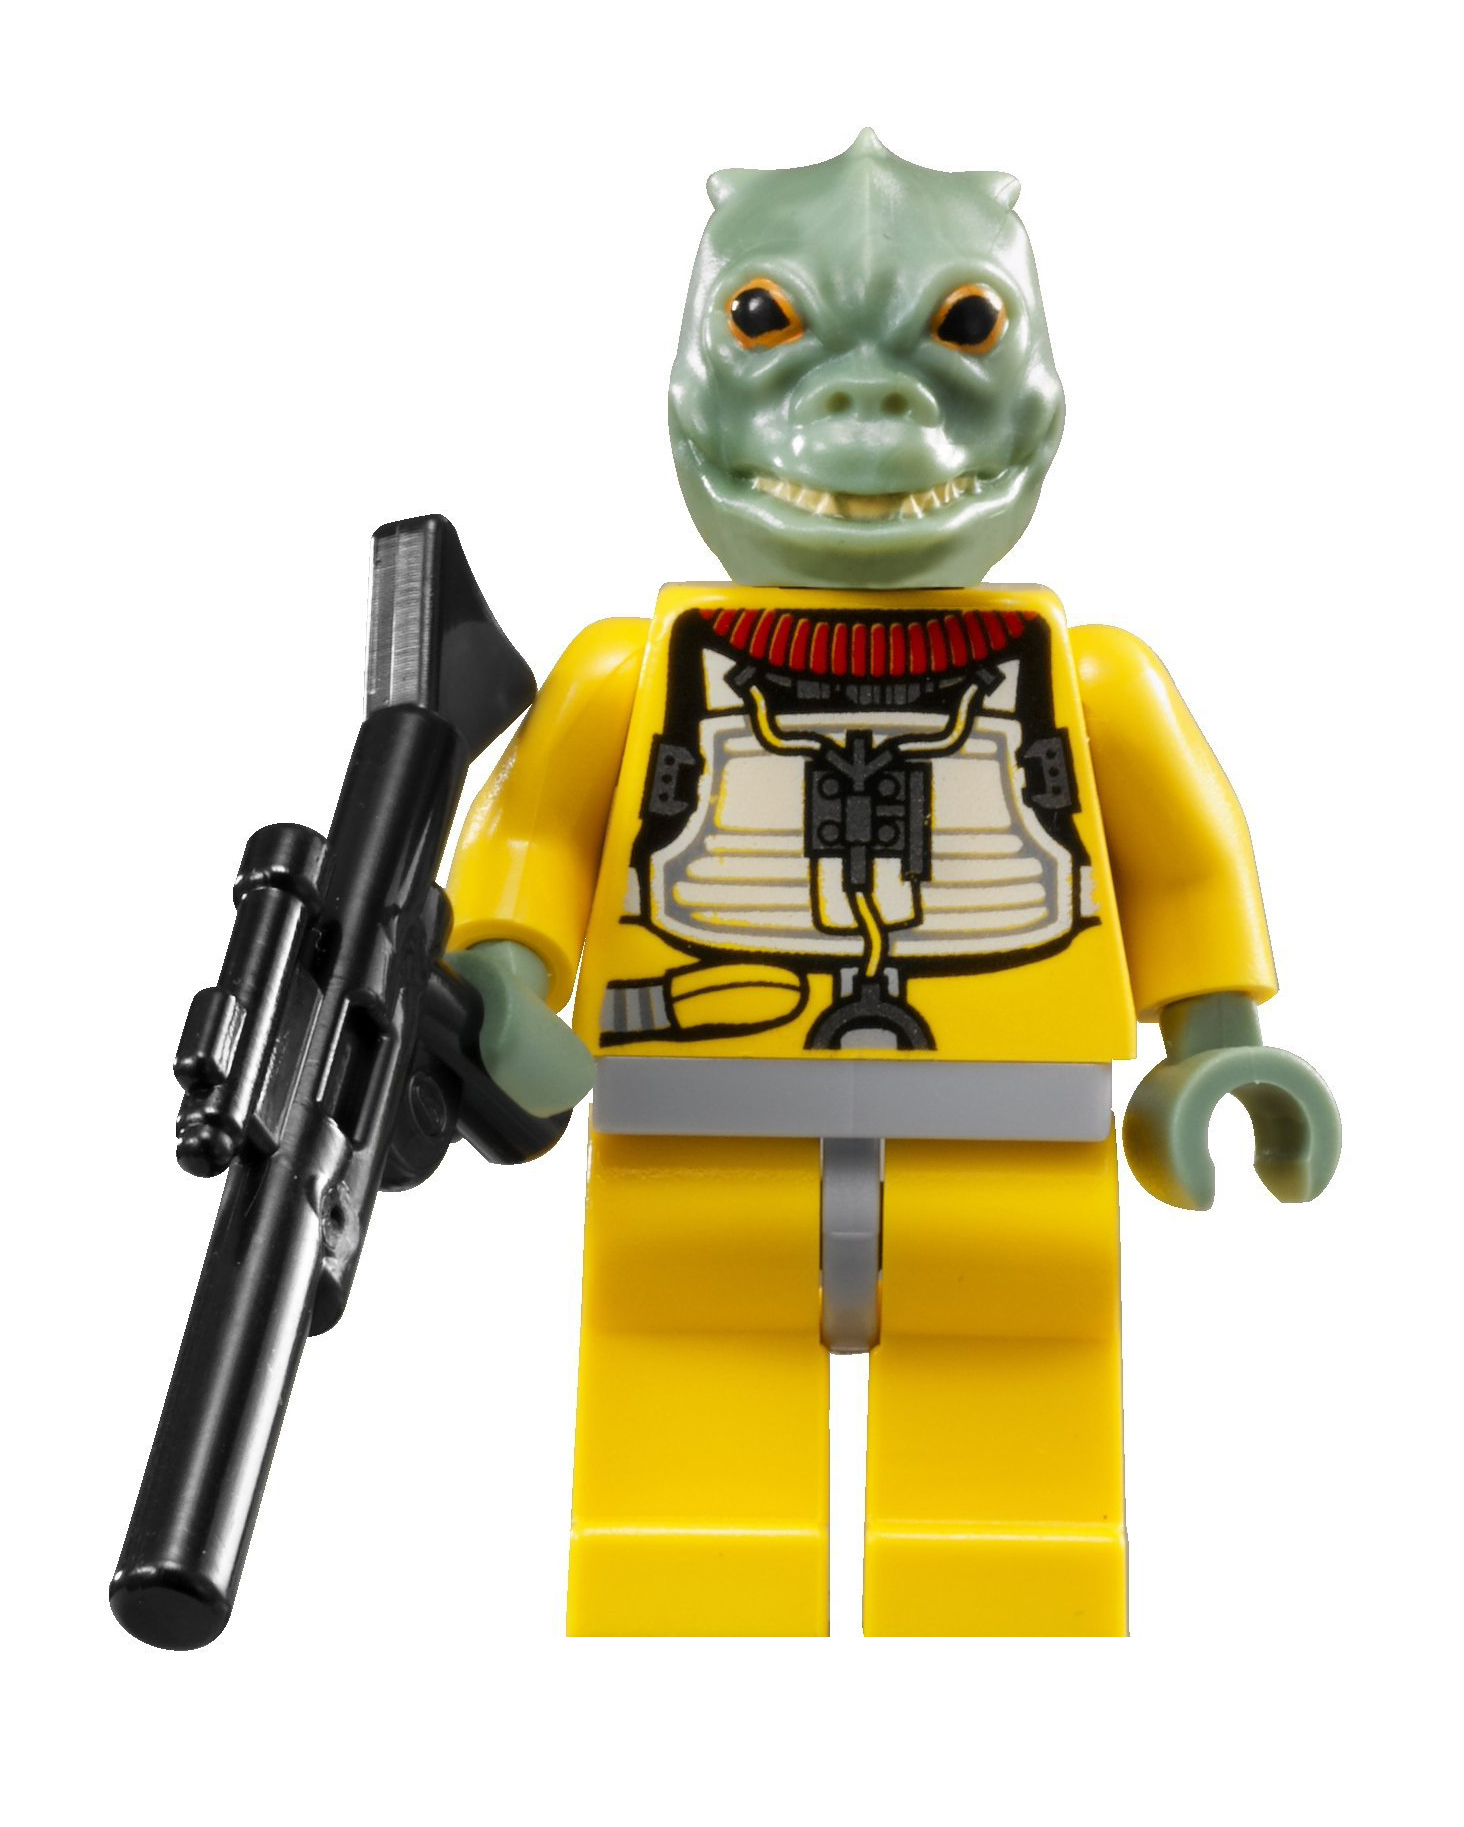 Bossk Star Wars Clone Wars Bossk Lego-star-wars-bossk